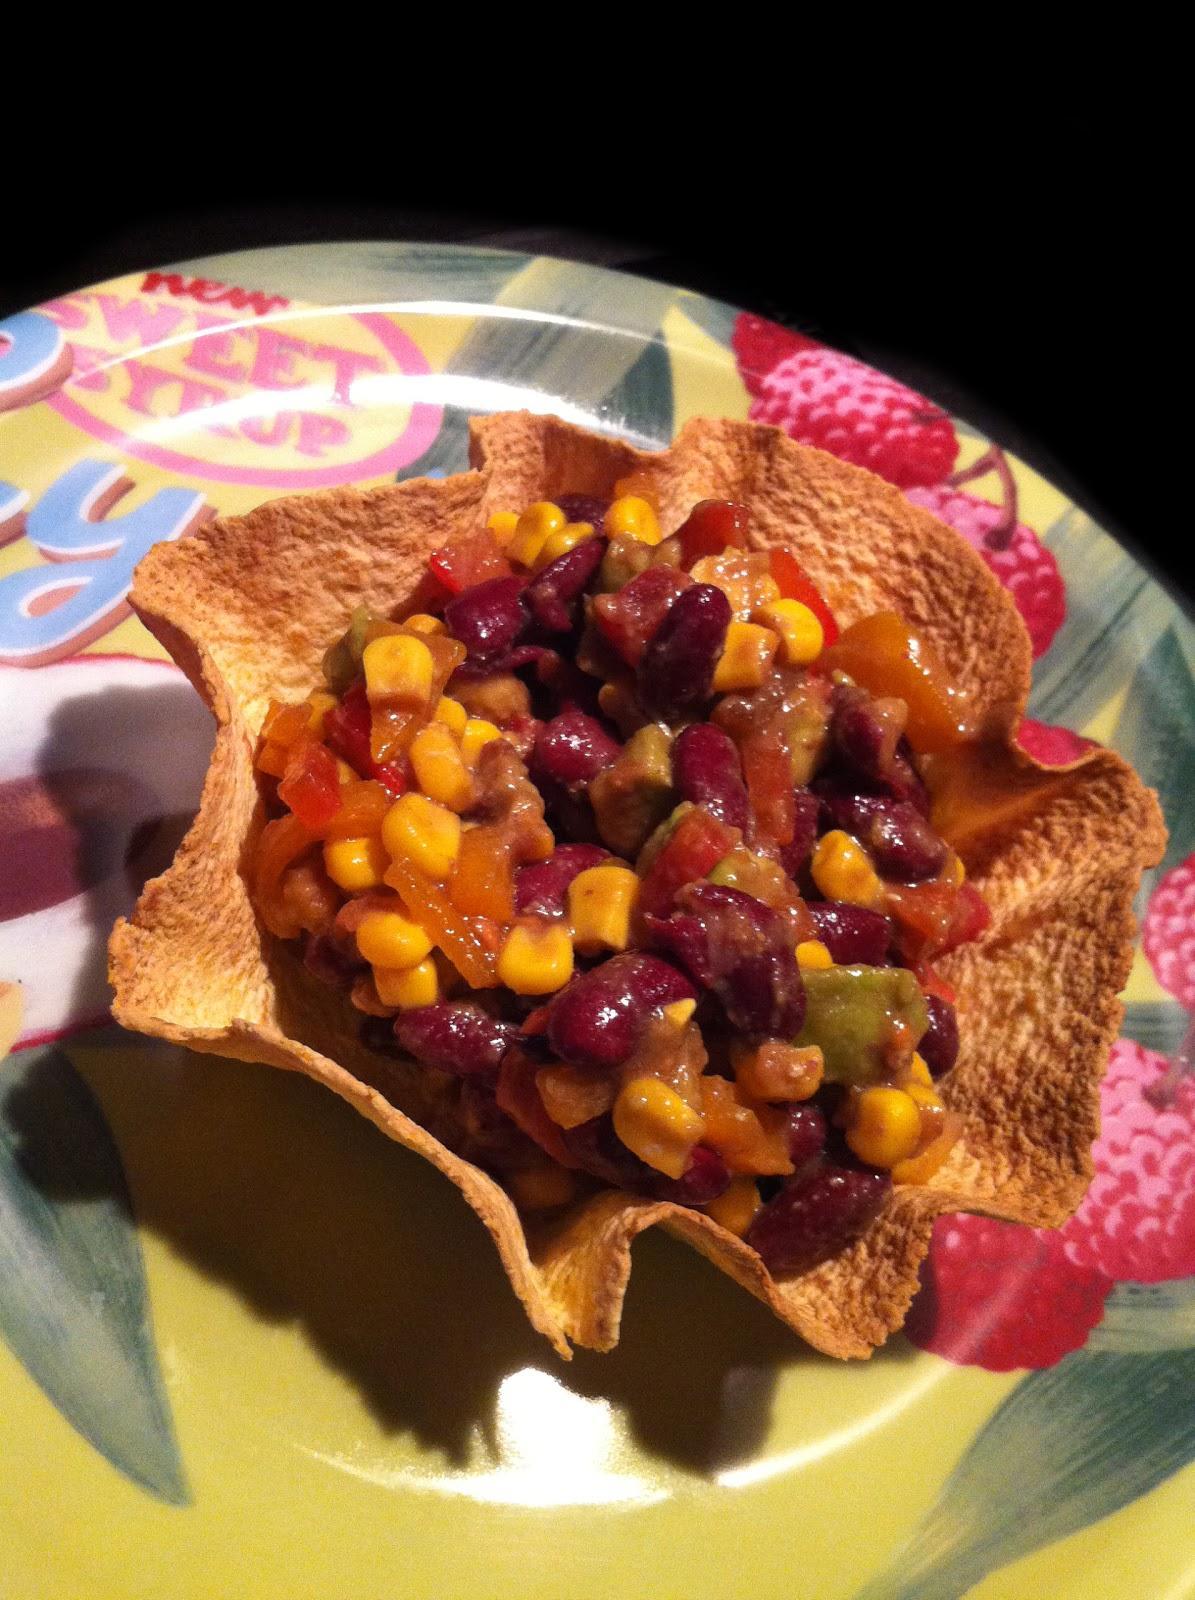 tacos salad mexicaine blogs de cuisine. Black Bedroom Furniture Sets. Home Design Ideas